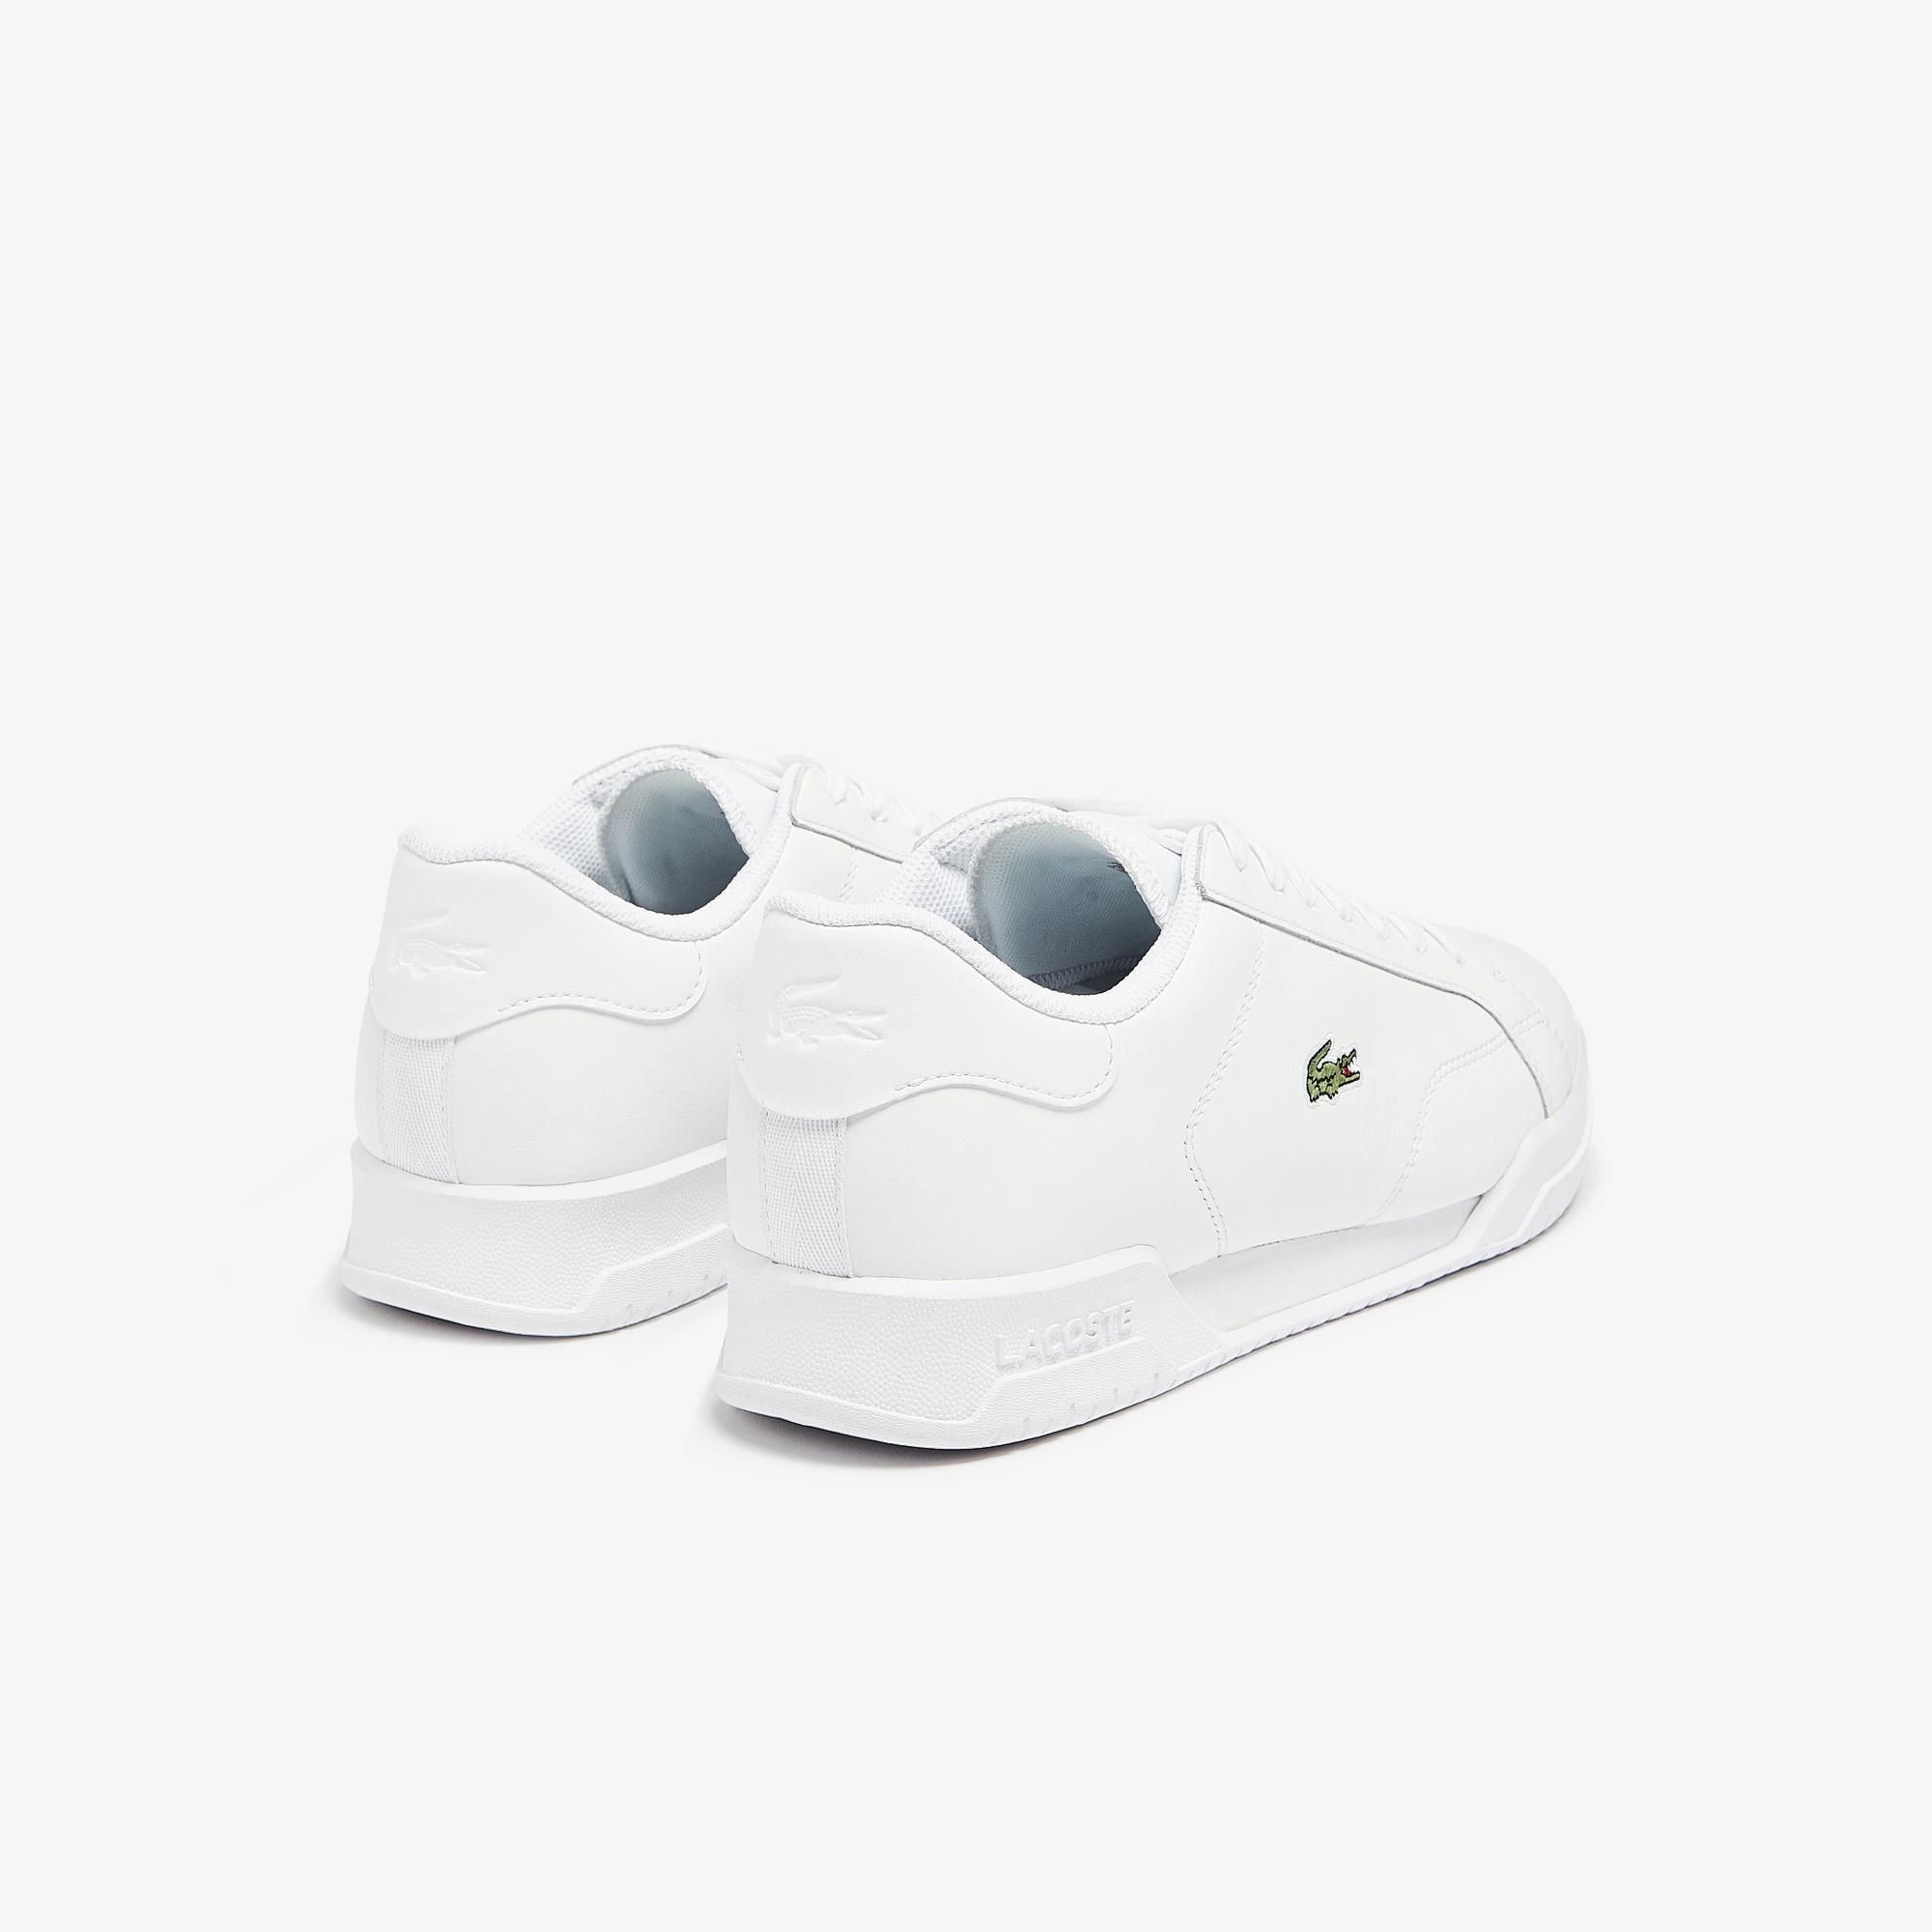 Lacoste кросівки чоловічі Twin Serve